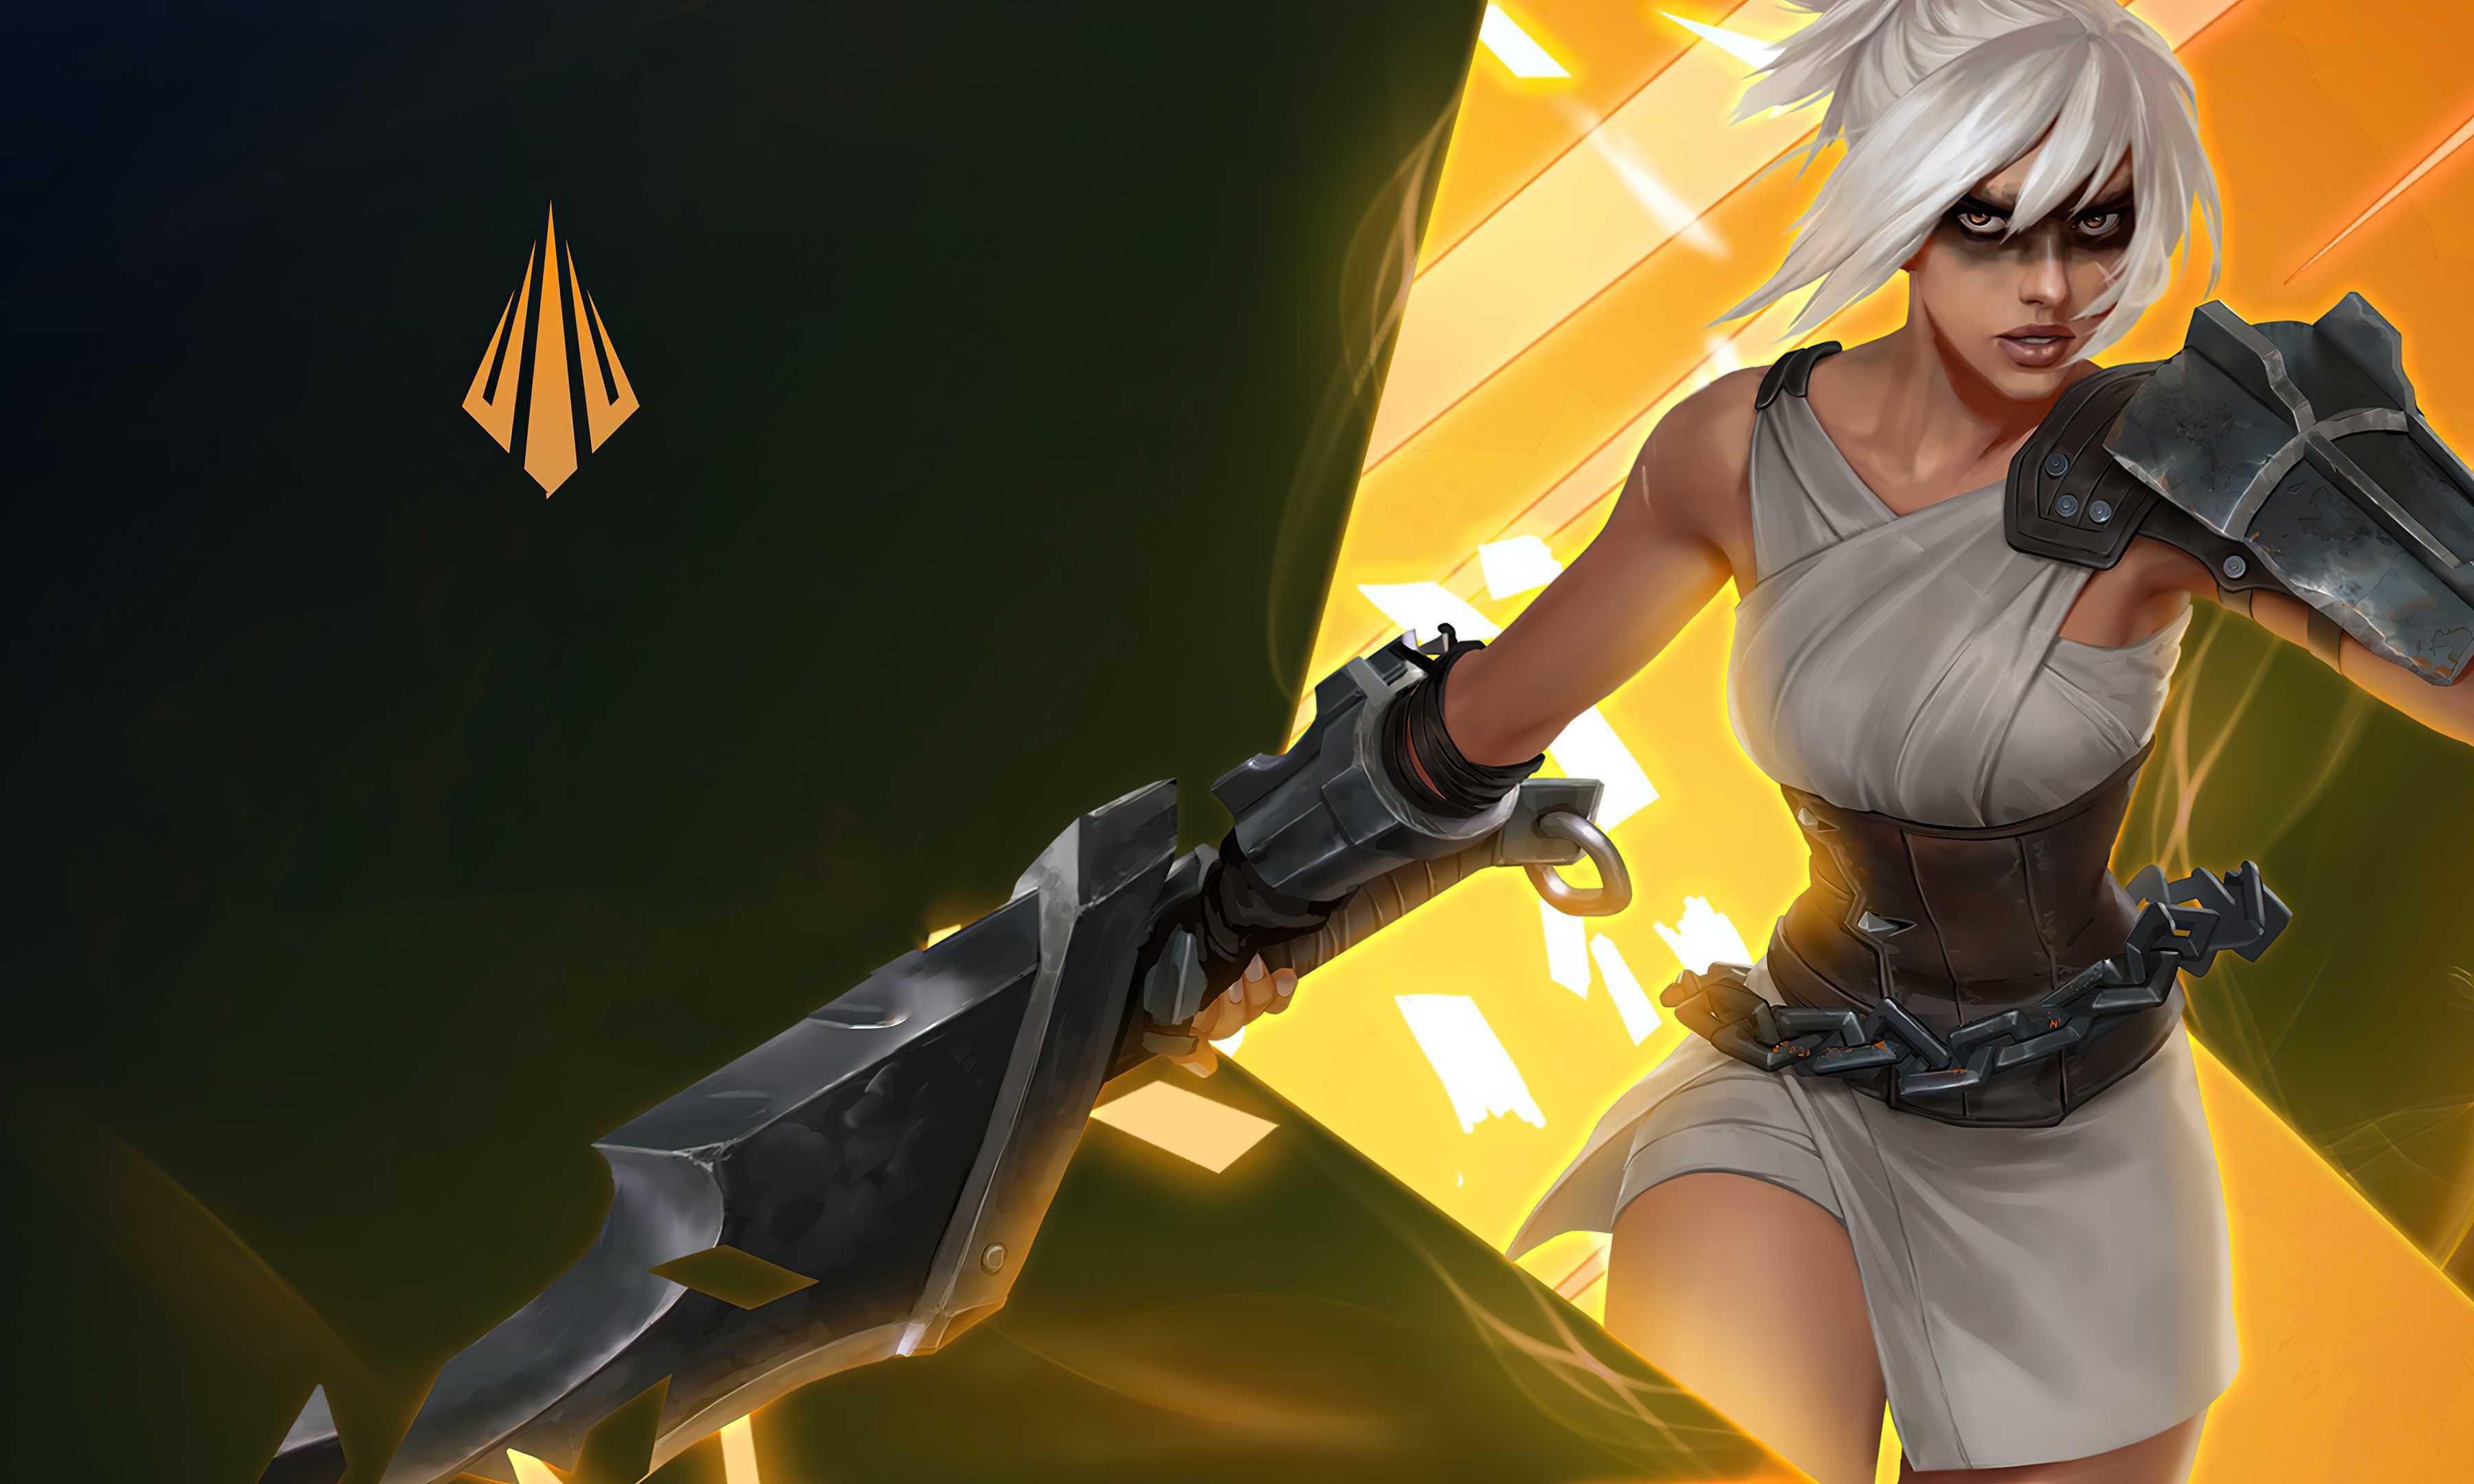 League Of Legends Riven Woman White Hair 4k Wallpaper Warrior